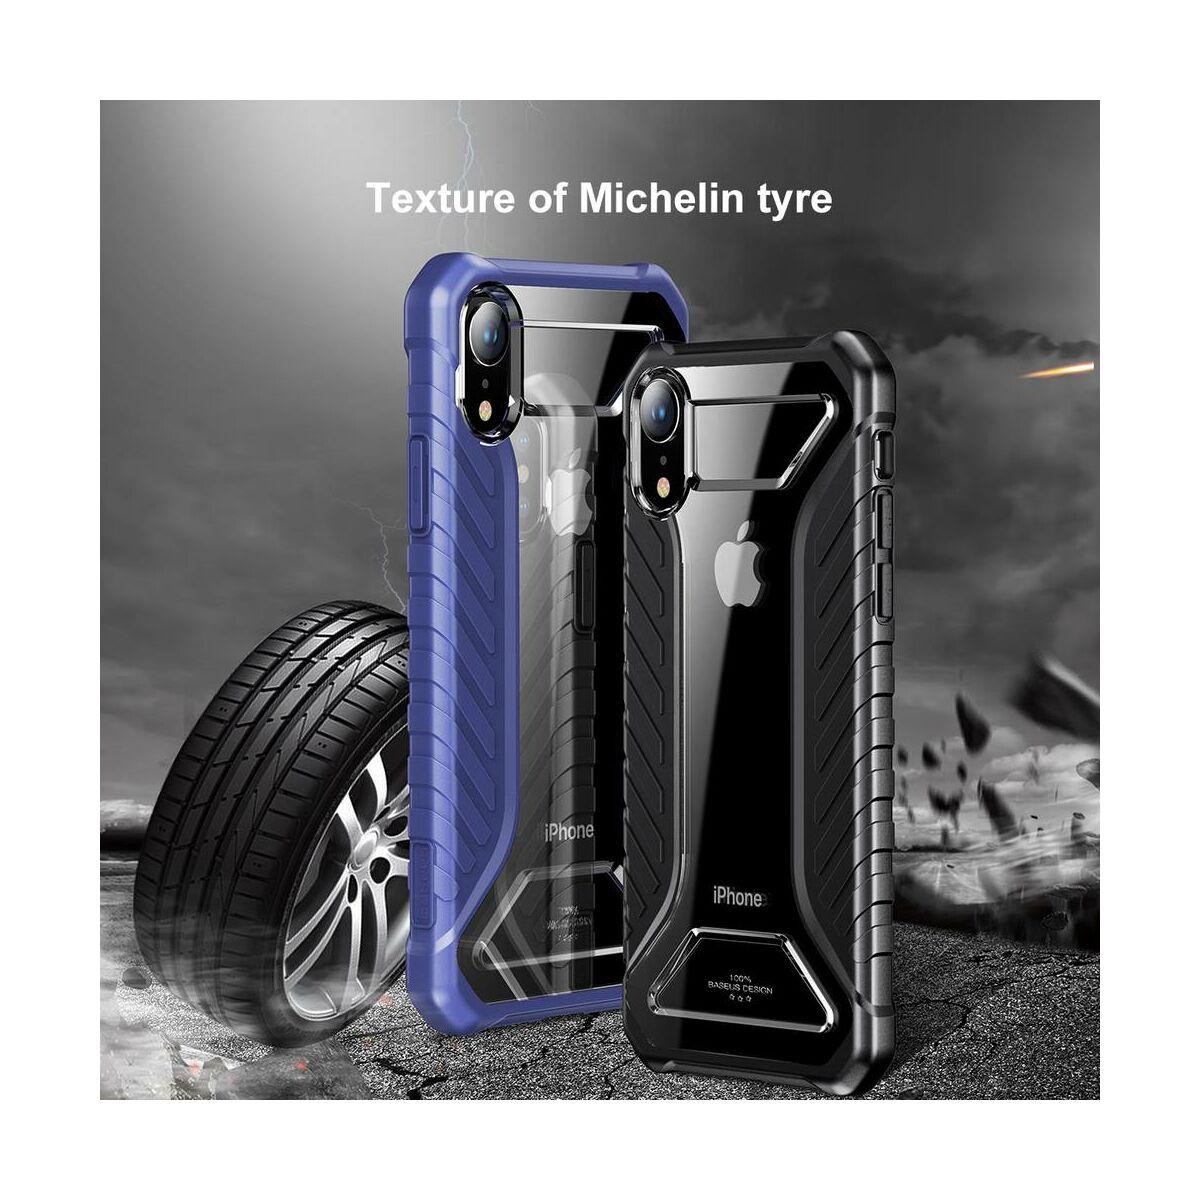 Baseus iPhone XR tok, Michelin, fekete (WIAPIPH61-MK01)